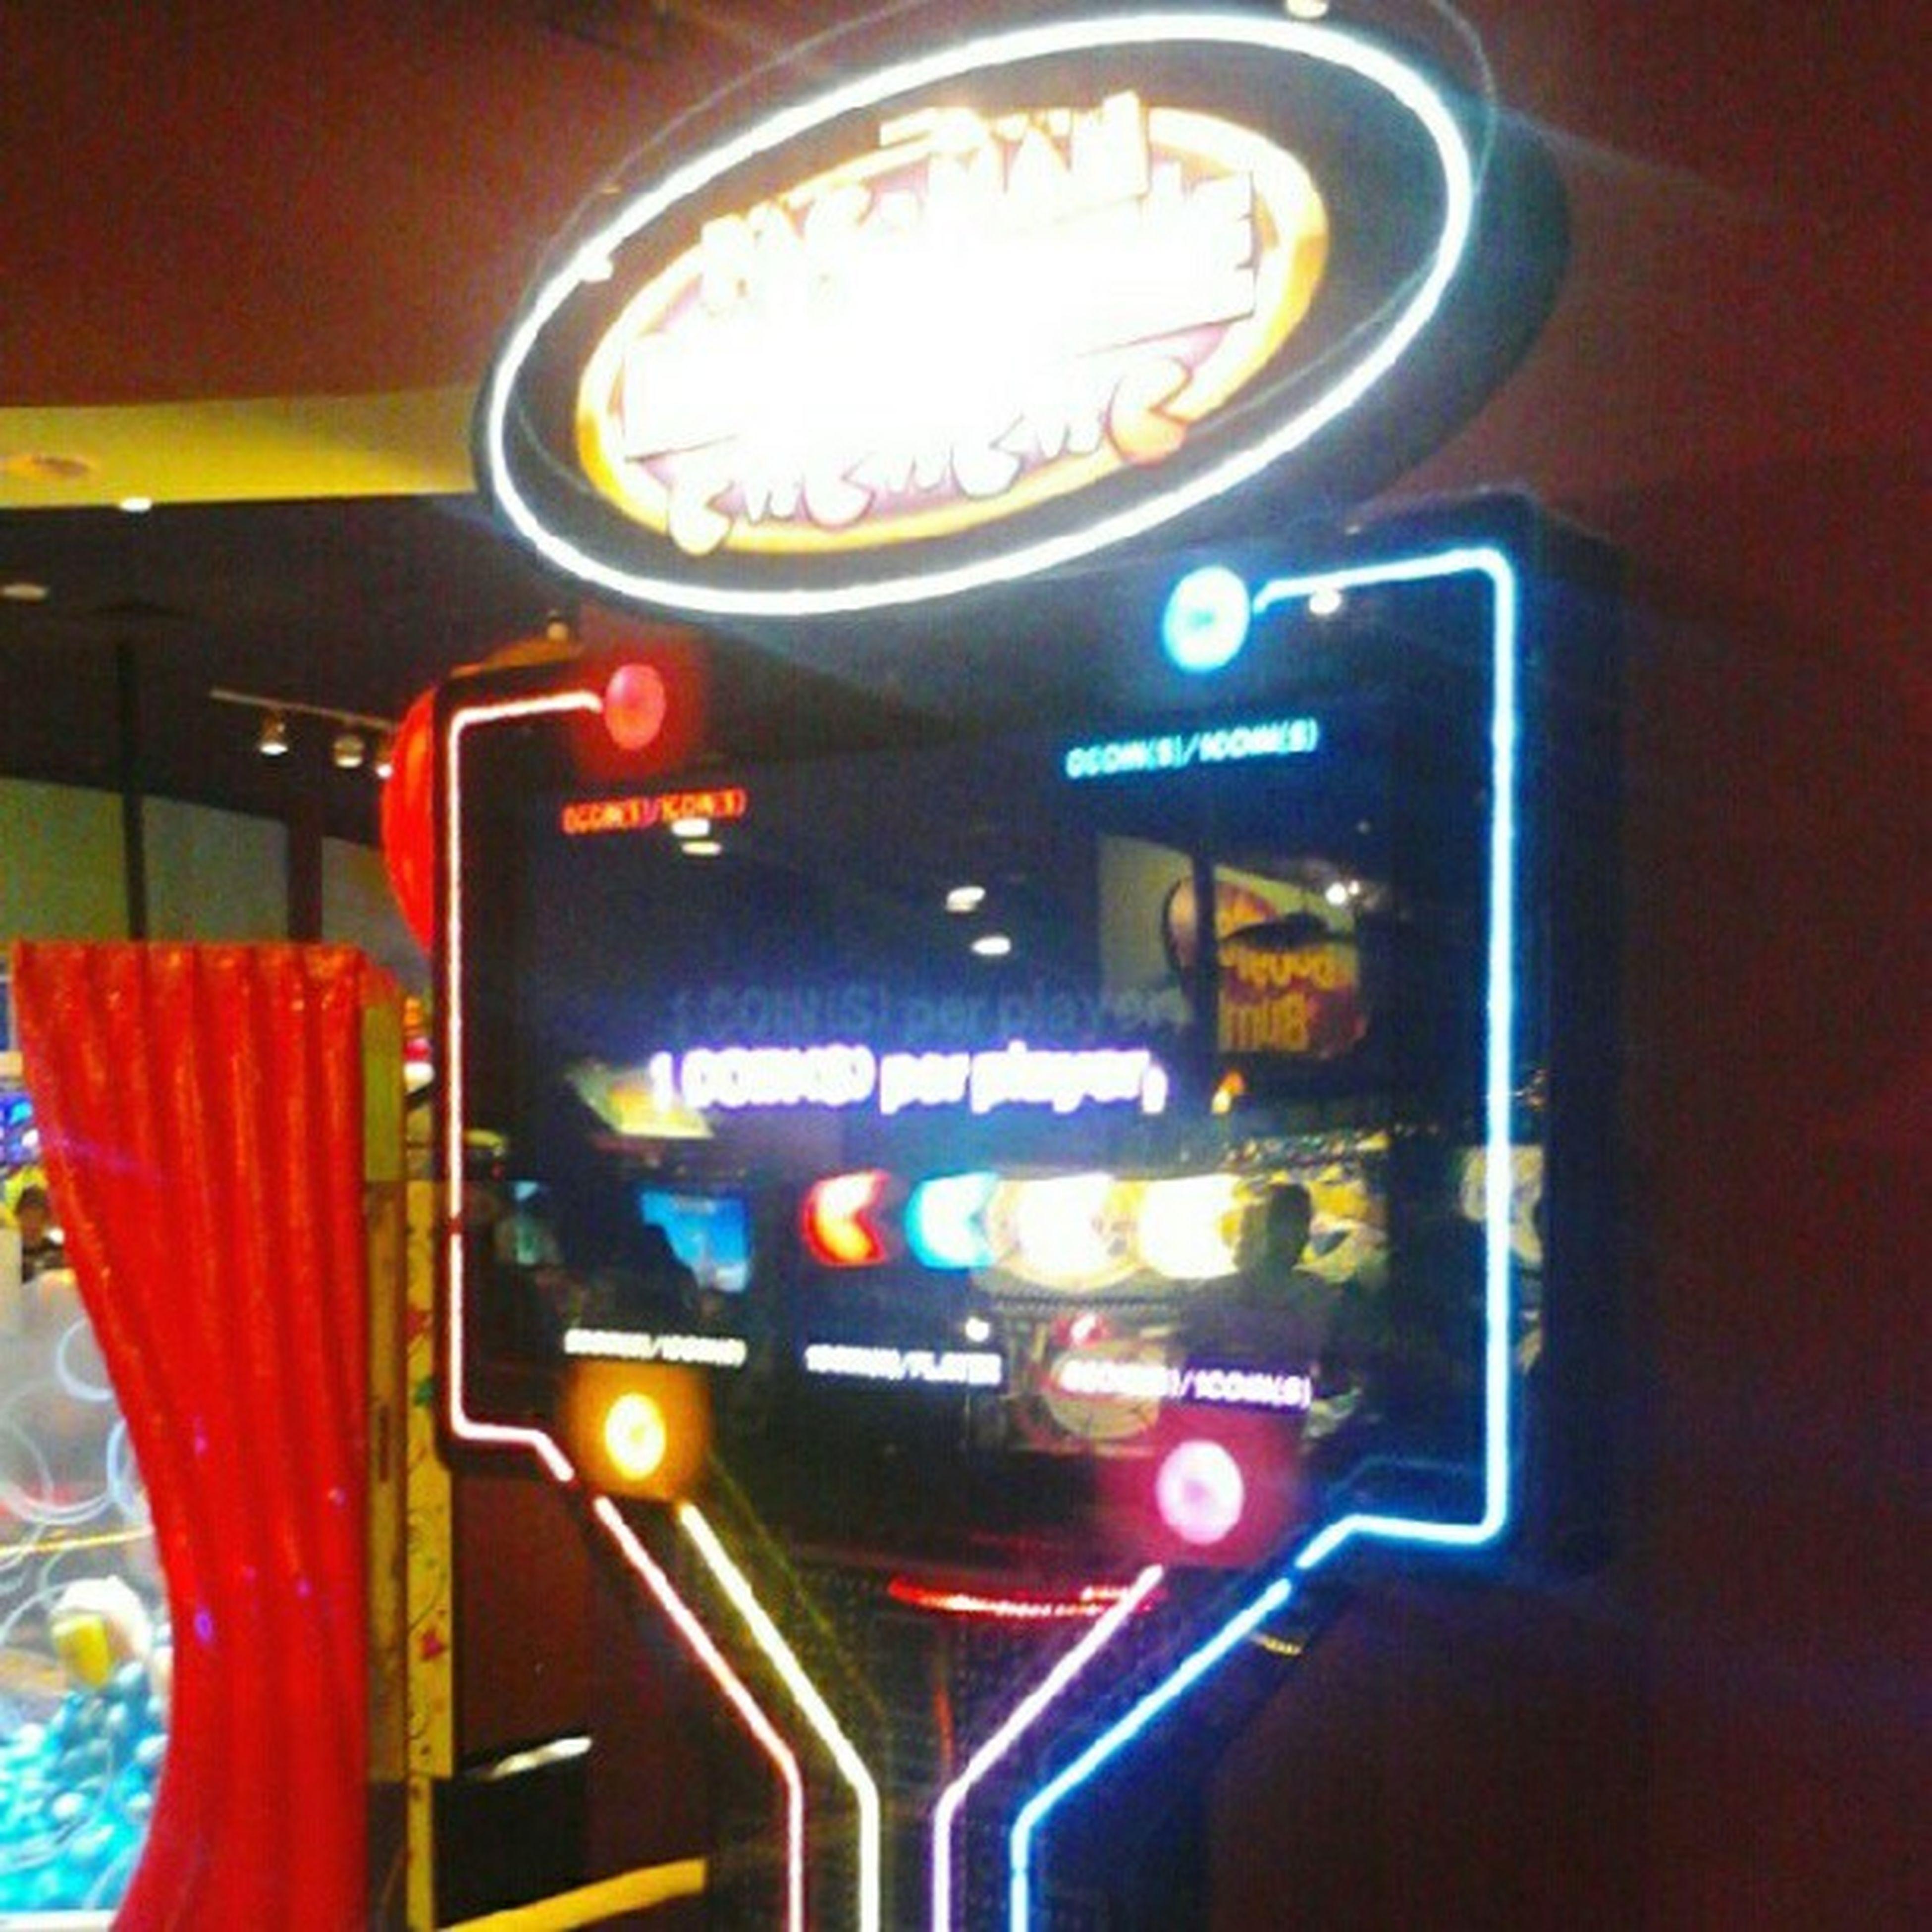 I own. #pwn #pacman #pacmanbattleroyal #arcade #games #letsplay Games Pacman Arcade Pwn Letsplay Pacmanbattleroyal